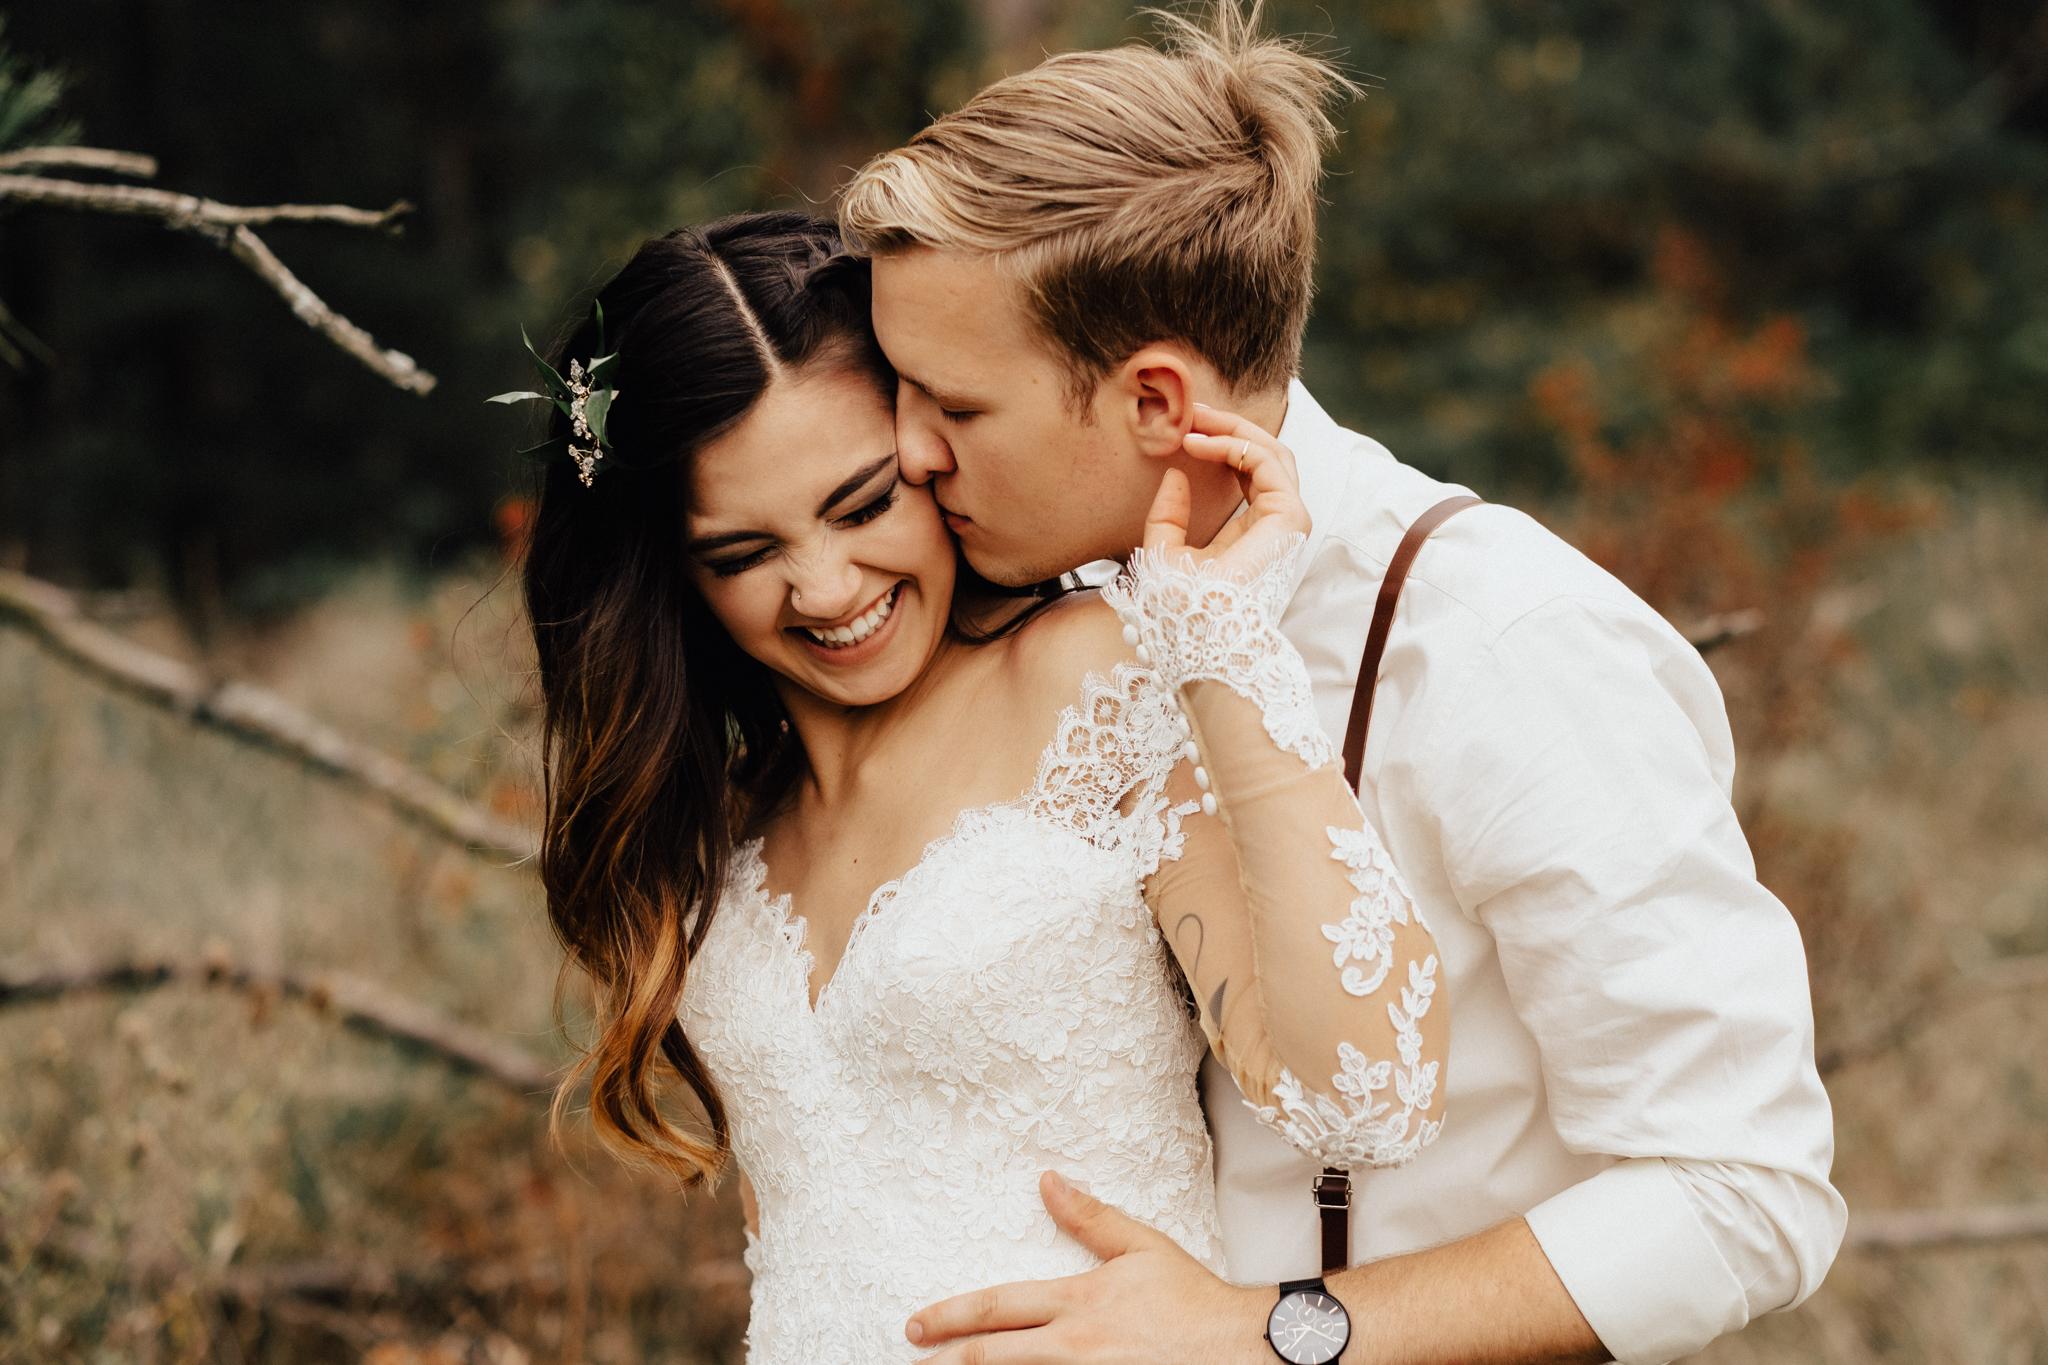 Arizona-Adventure-Elopement-Wedding-Photographer-175.jpg